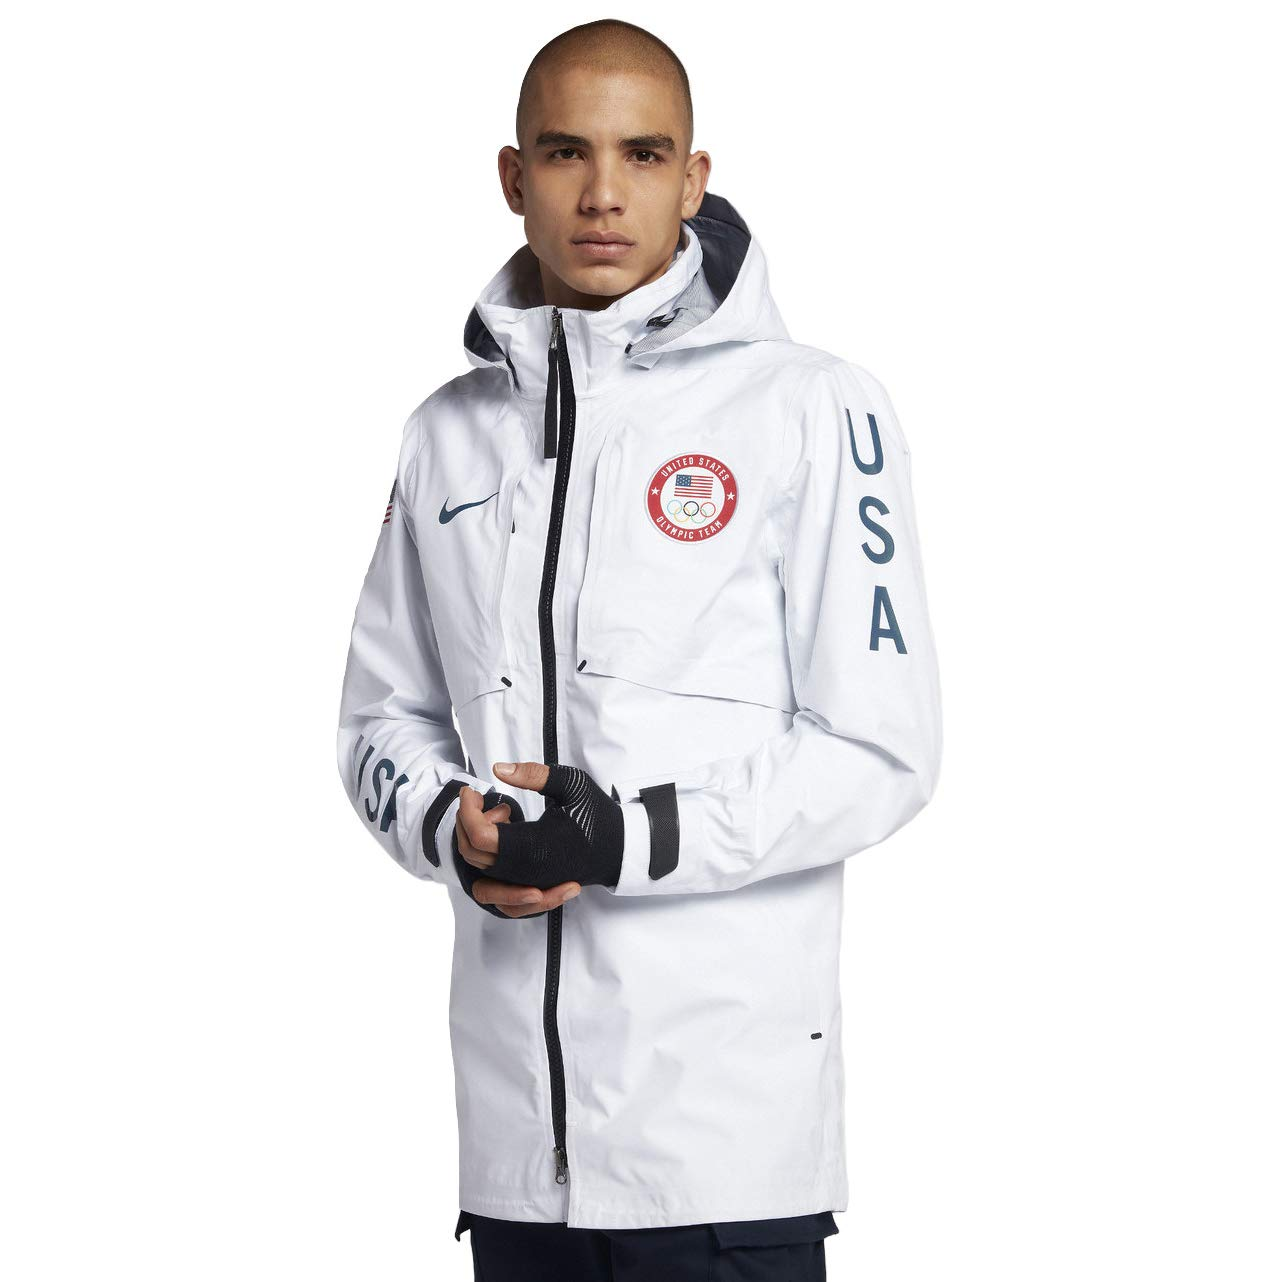 Nike Lab USA Medal Stand Men's Jacket (White/Black, Large)